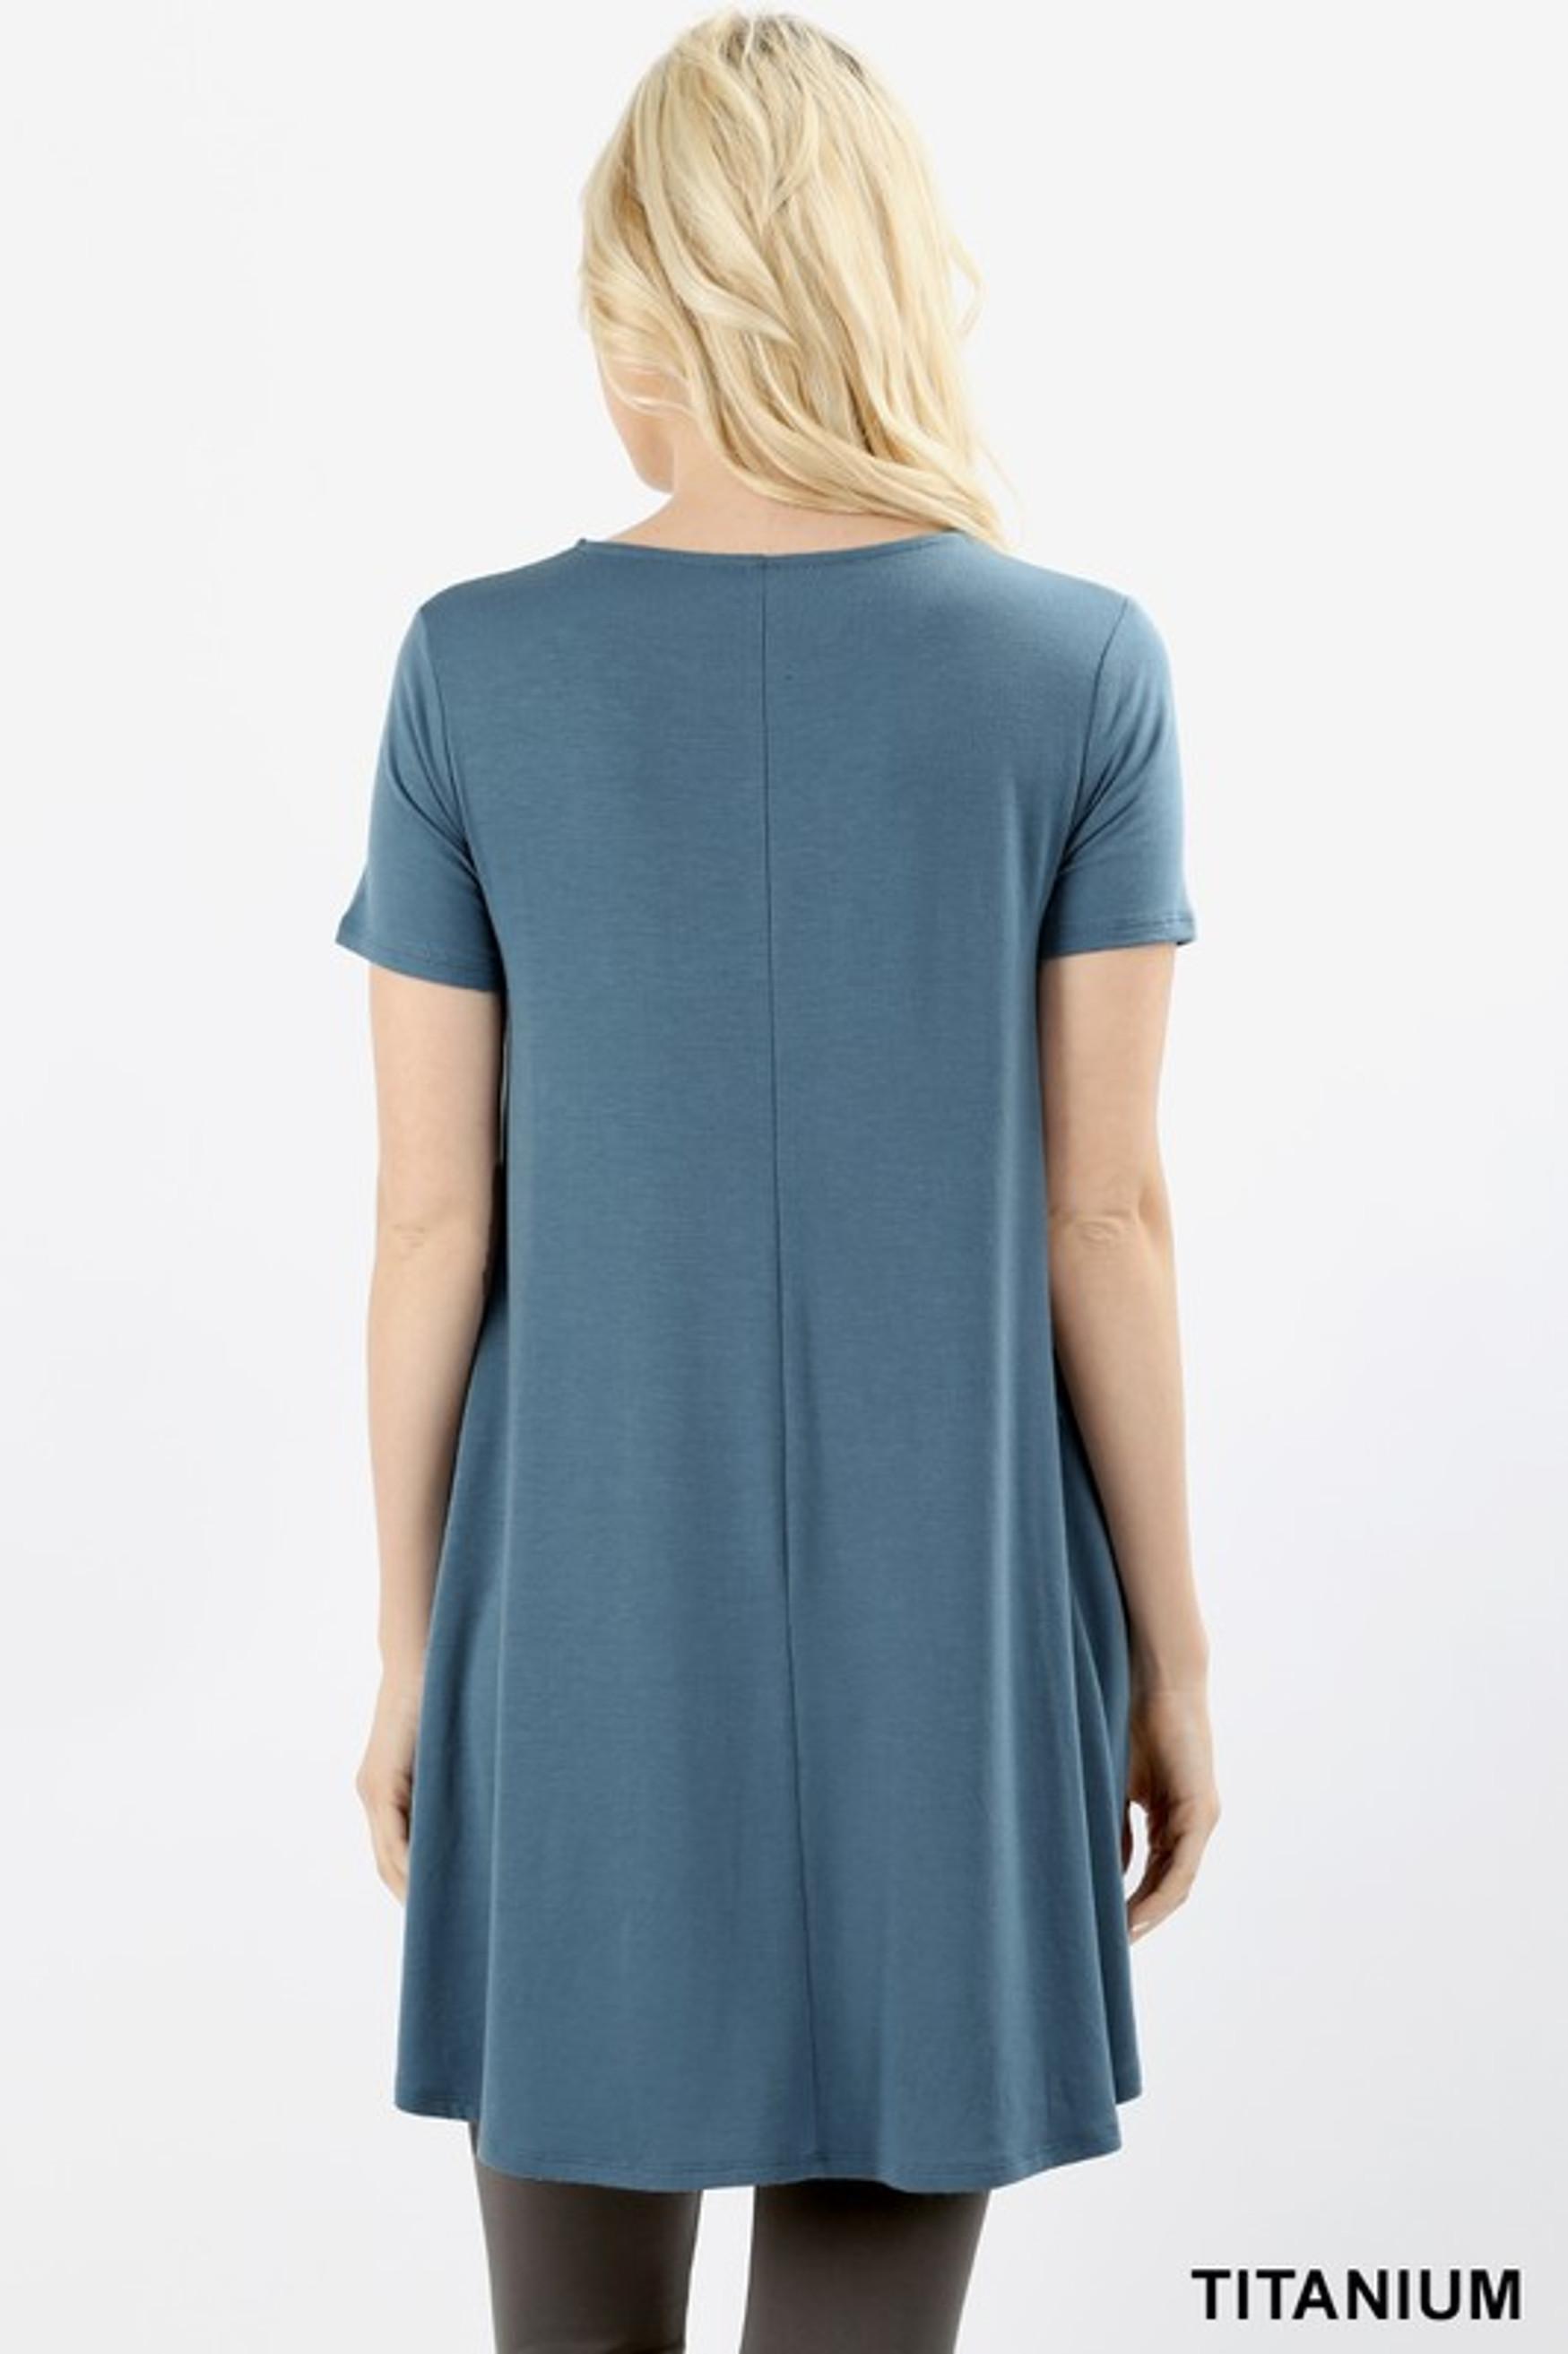 Round Neck Round Hem Short Sleeves Tunic with Pockets